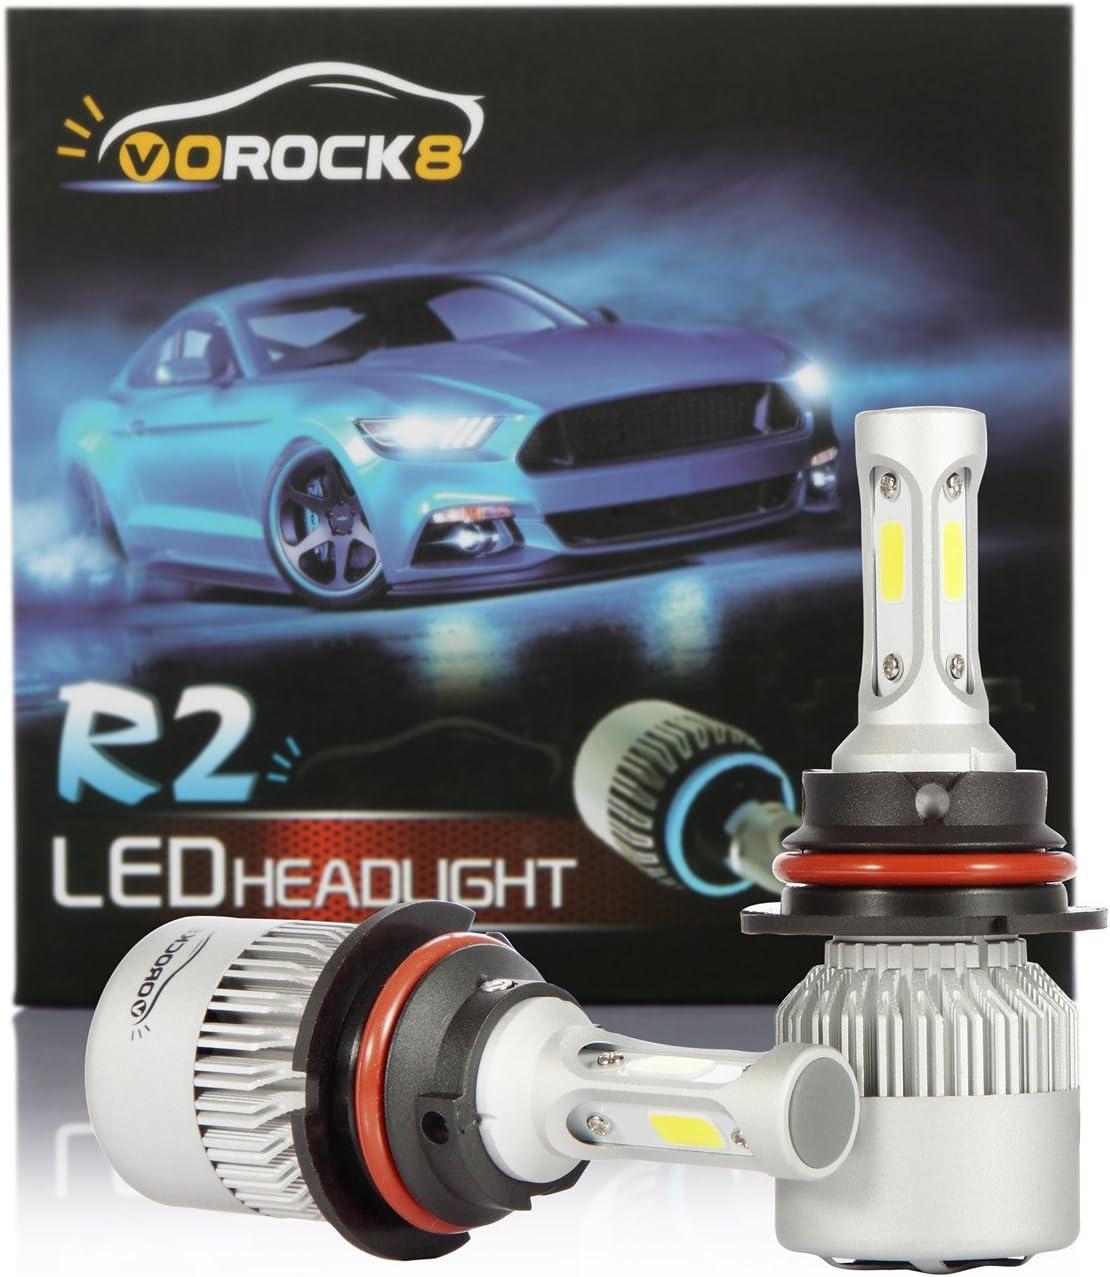 VoRock8 R2 COB 9007 HB5 8000 Lumens Led Headlight Conversion Kit, High Low Beam Headlamp, Dual Beam Head Light, Halogen Head Light Replacement, 6500K Xenon White, 1 Pair